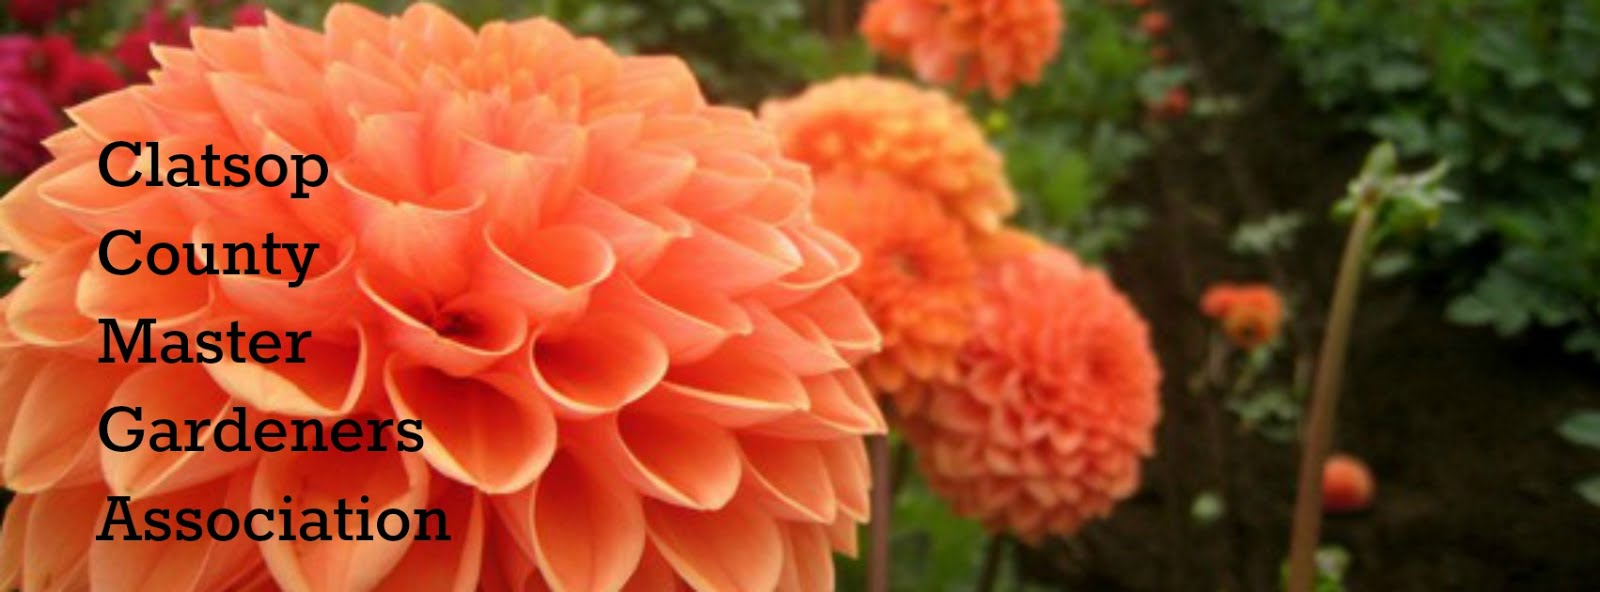 Clatsop County Master Gardeners Association